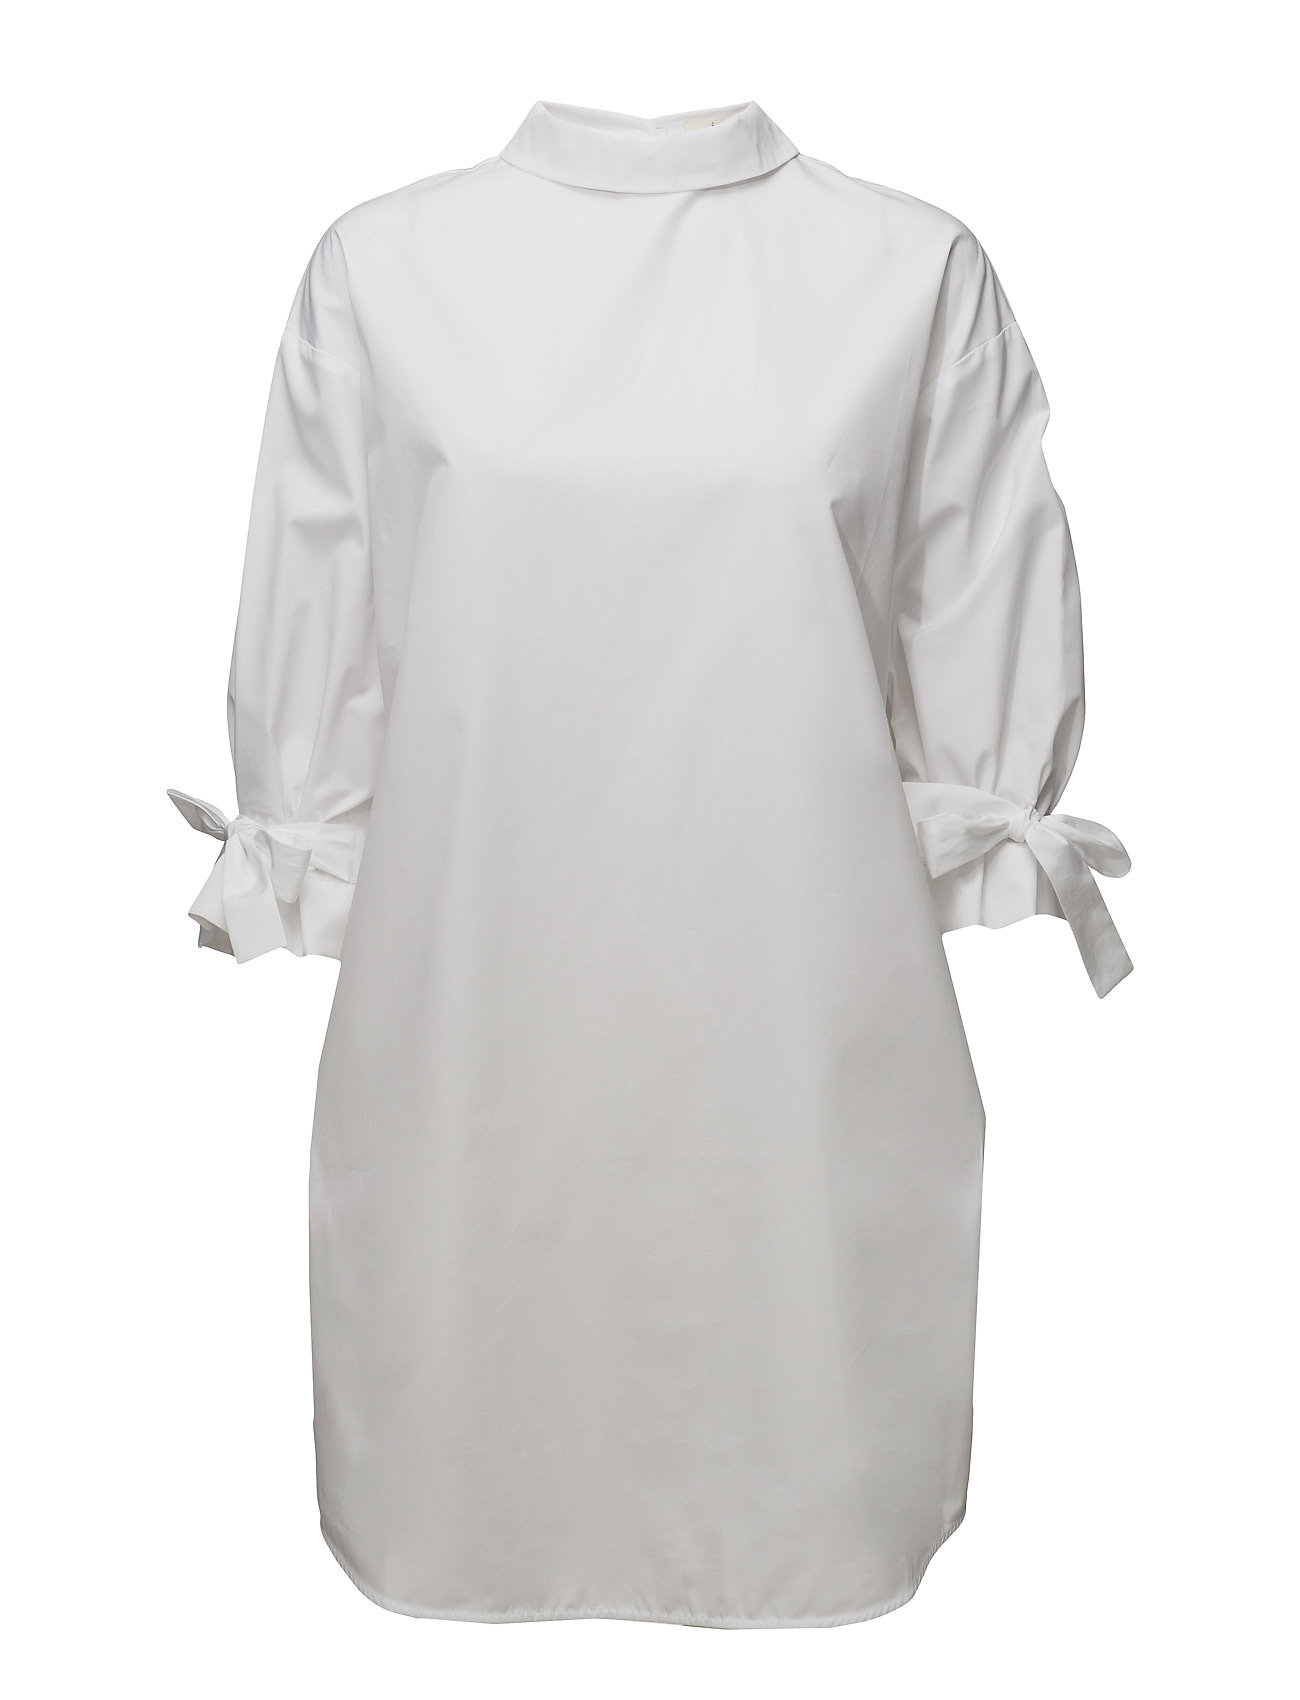 ÁERON Backwards shirt dress